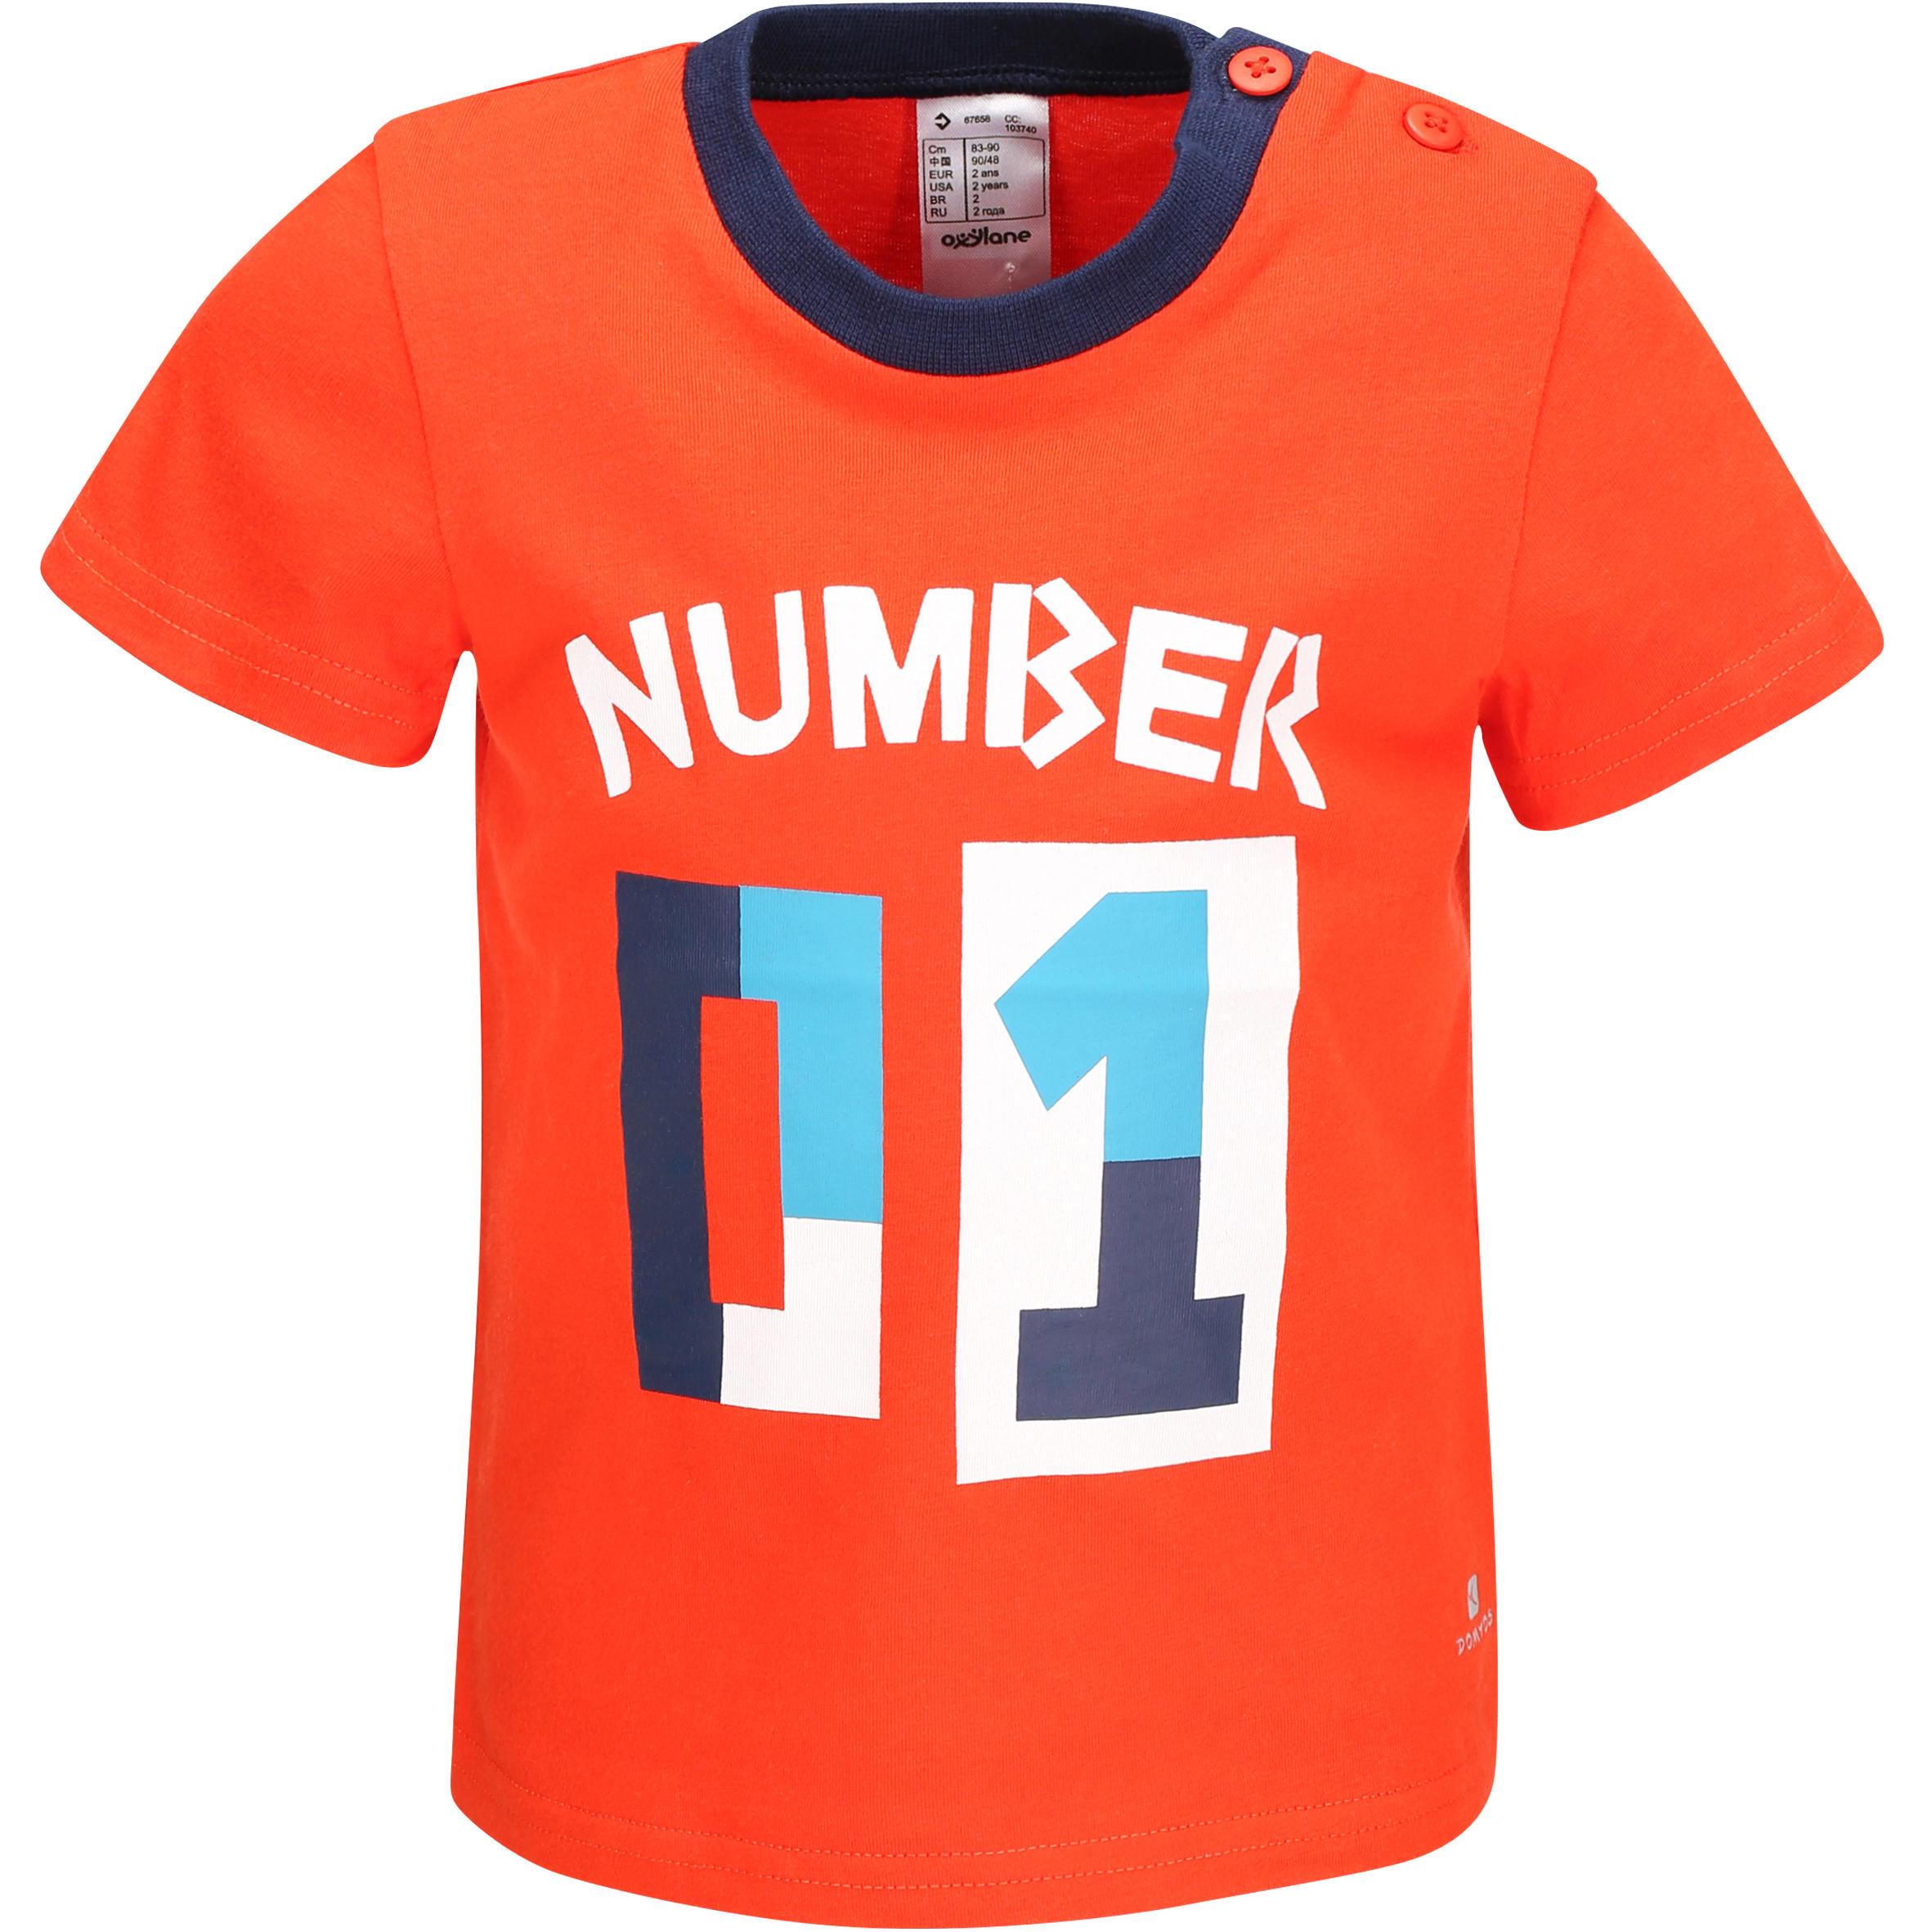 Baby Boys' Short-Sleeved T-Shirt - Merah